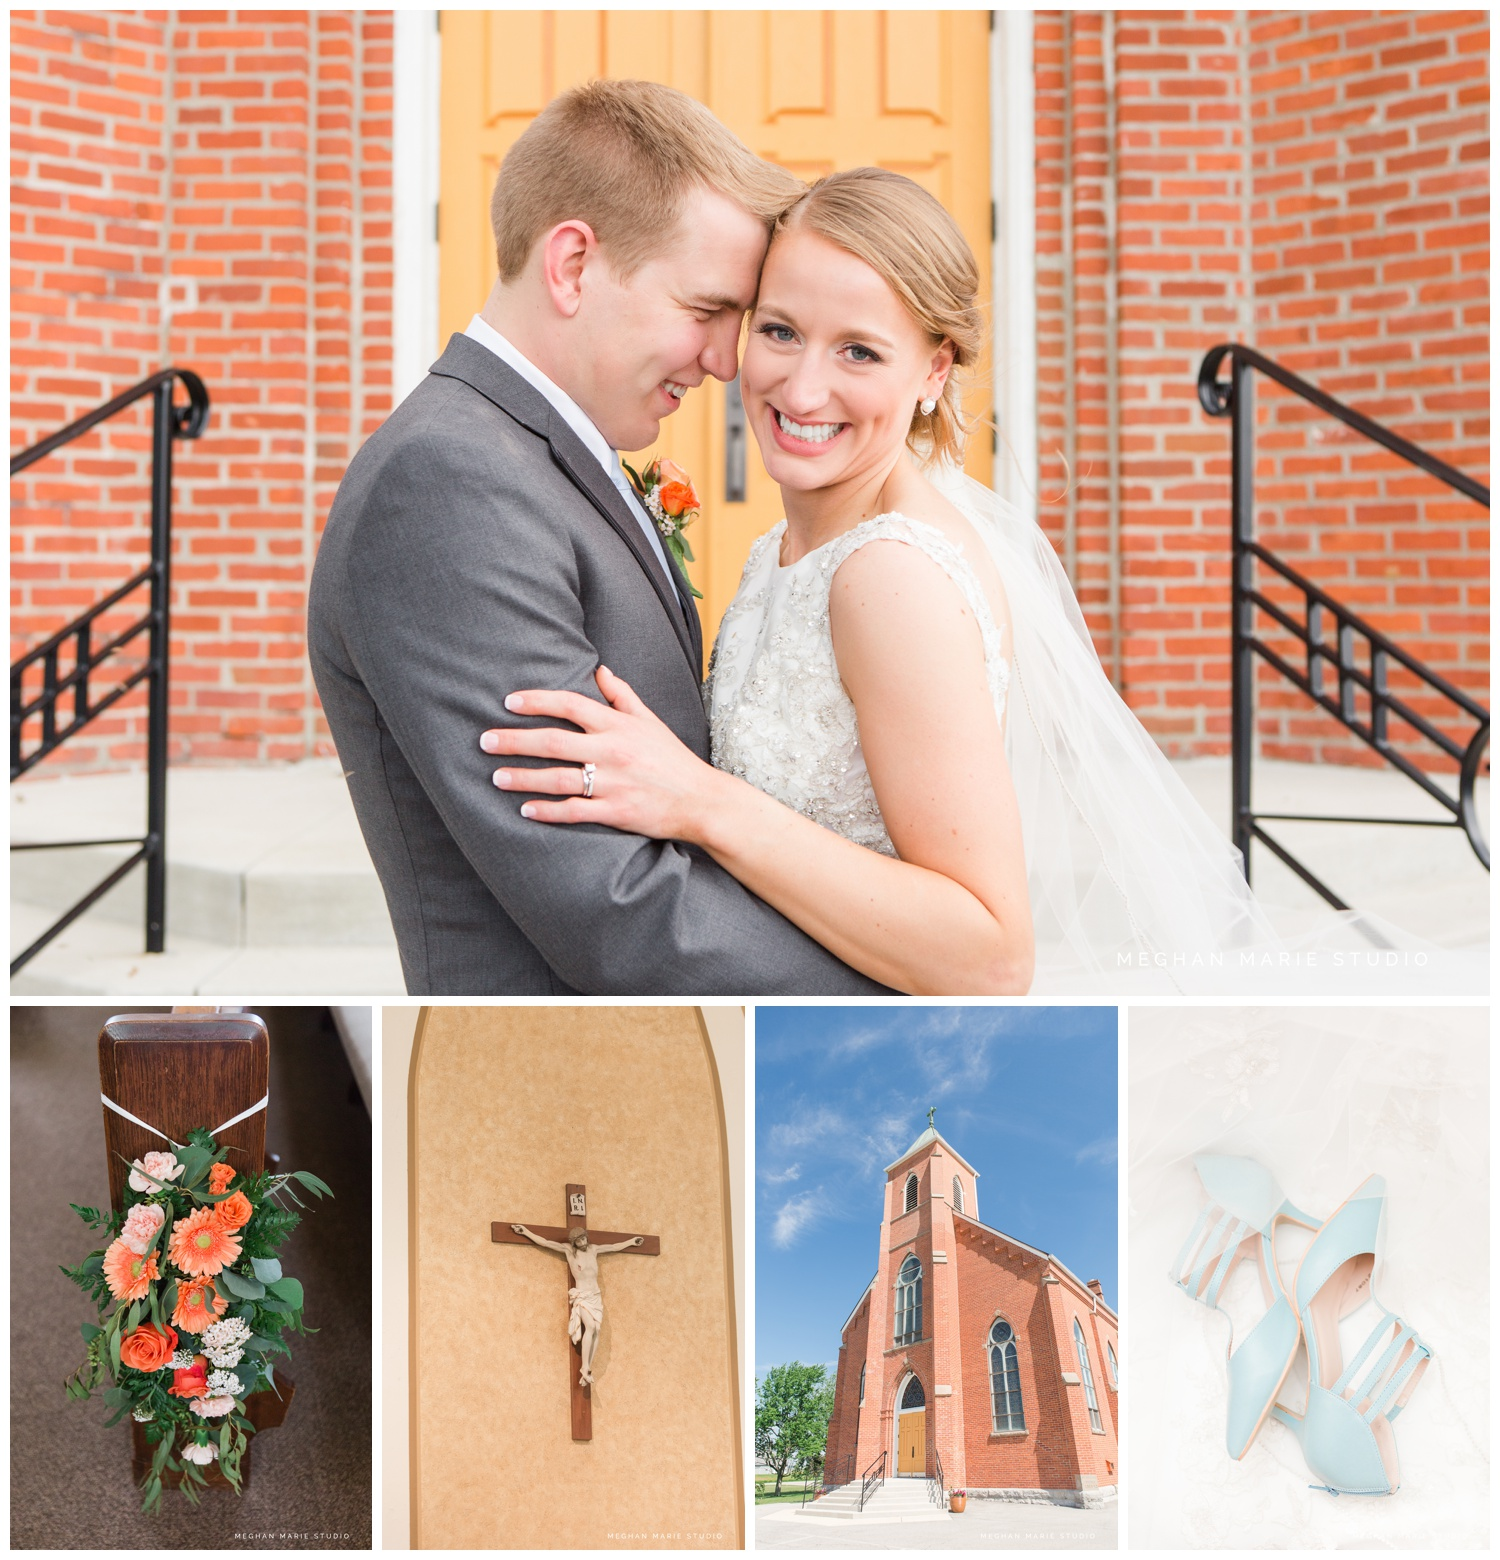 meghan marie studio ohio Stained Glass Church Windows, Cornflower Blue Decor, Peach Roses, & Puppy Wedding Kisses wedding photographer dayton catholic rustic yellows oranges_0411.jpg